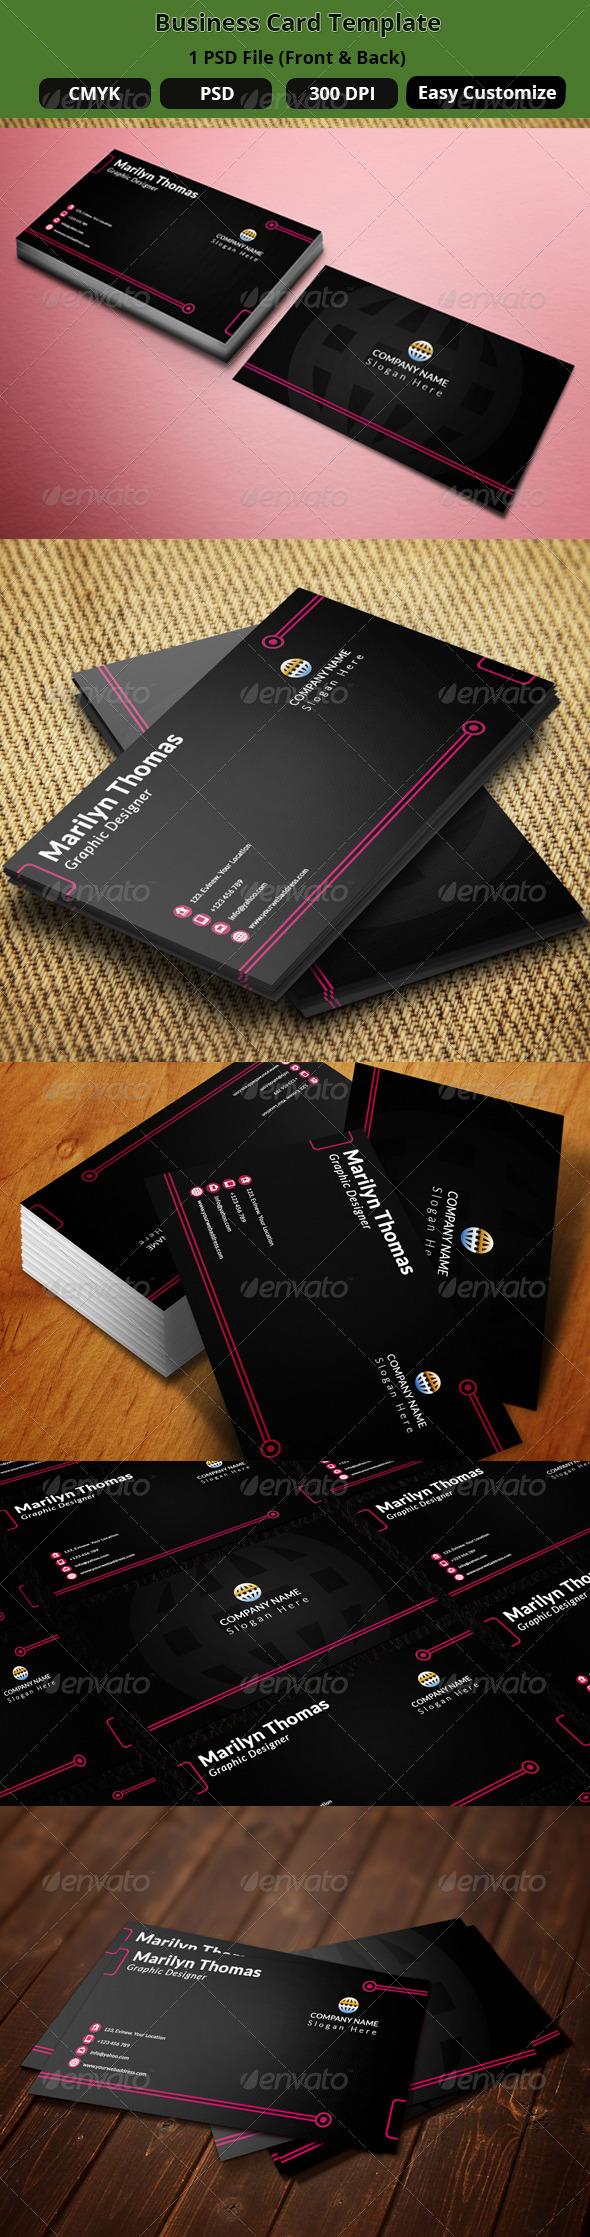 GraphicRiver Business Card Design 101 7733139